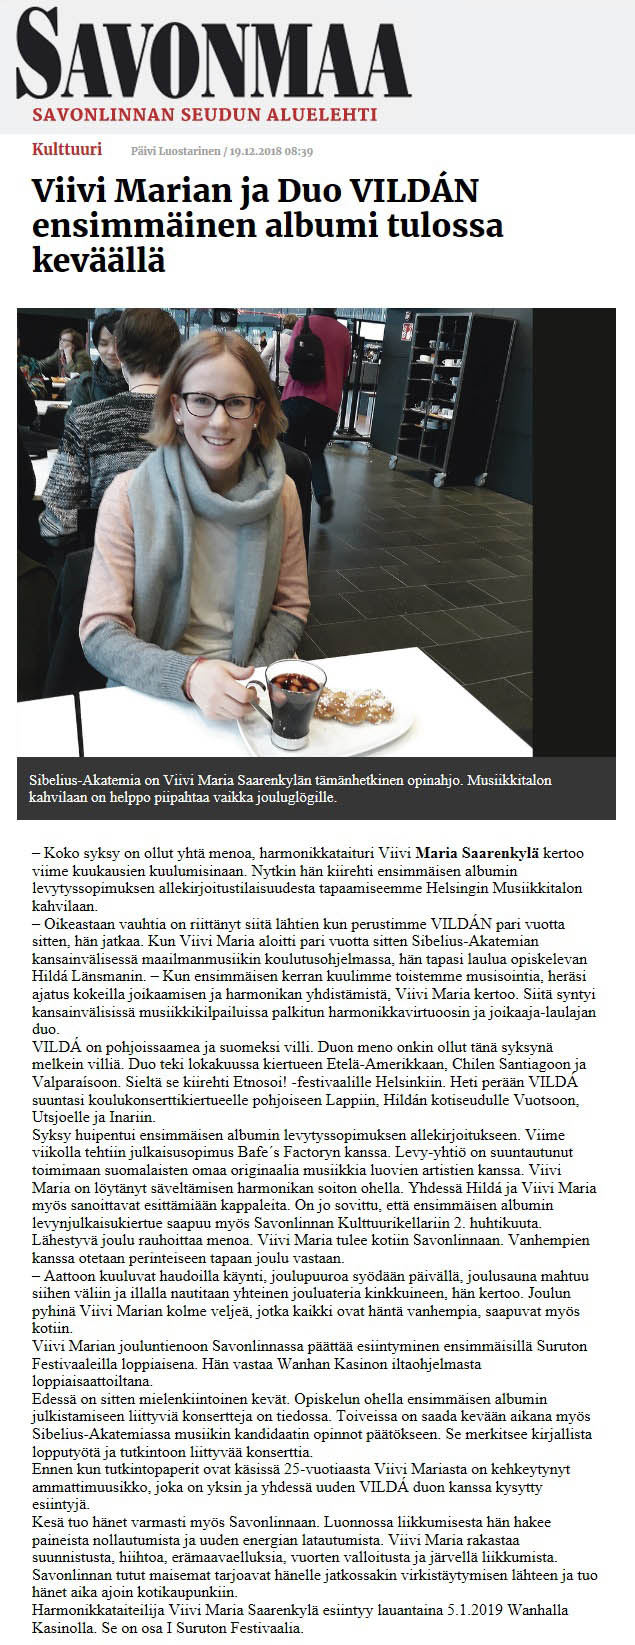 Savonmaa (Finland), 19.12.2018